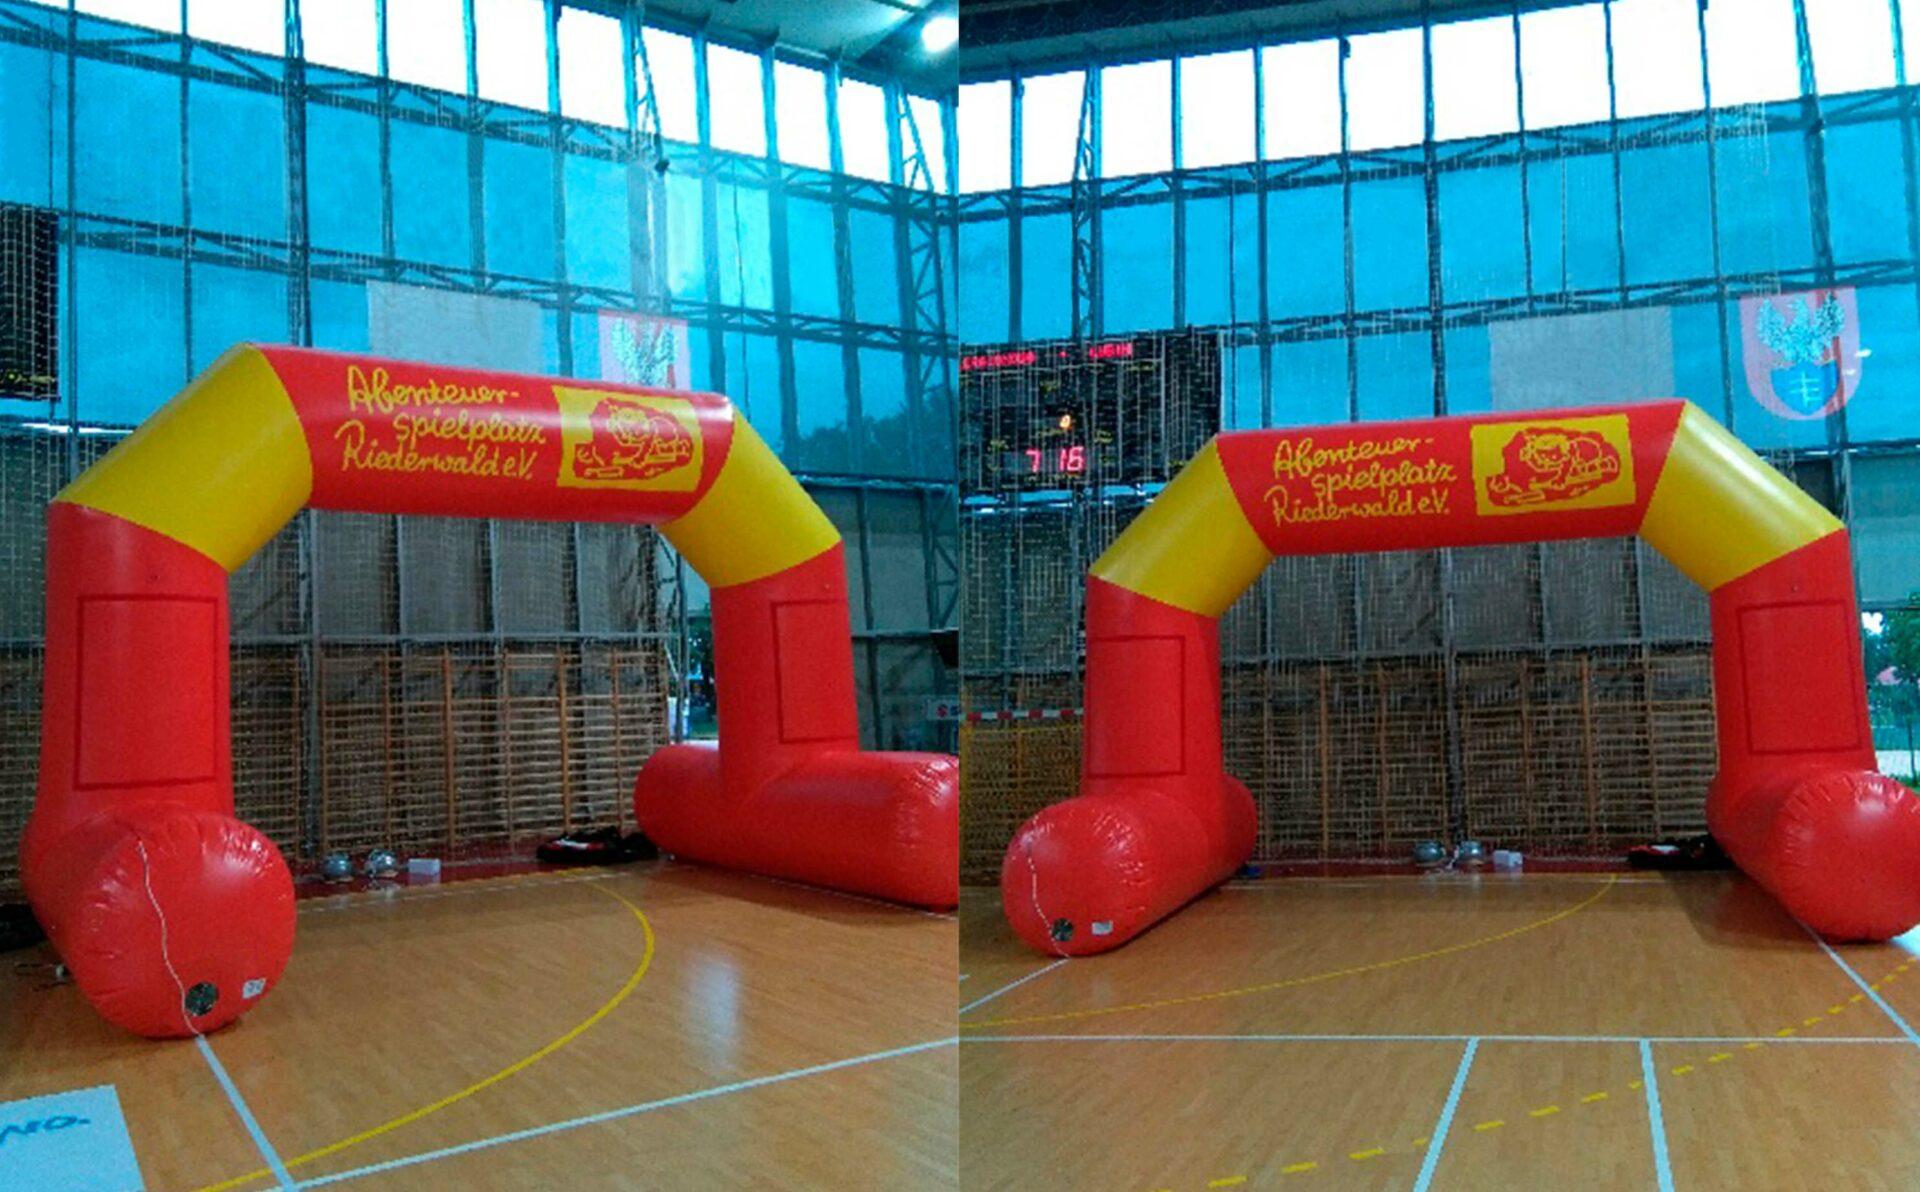 riederwalde-inflatable-archway-advertising-arch